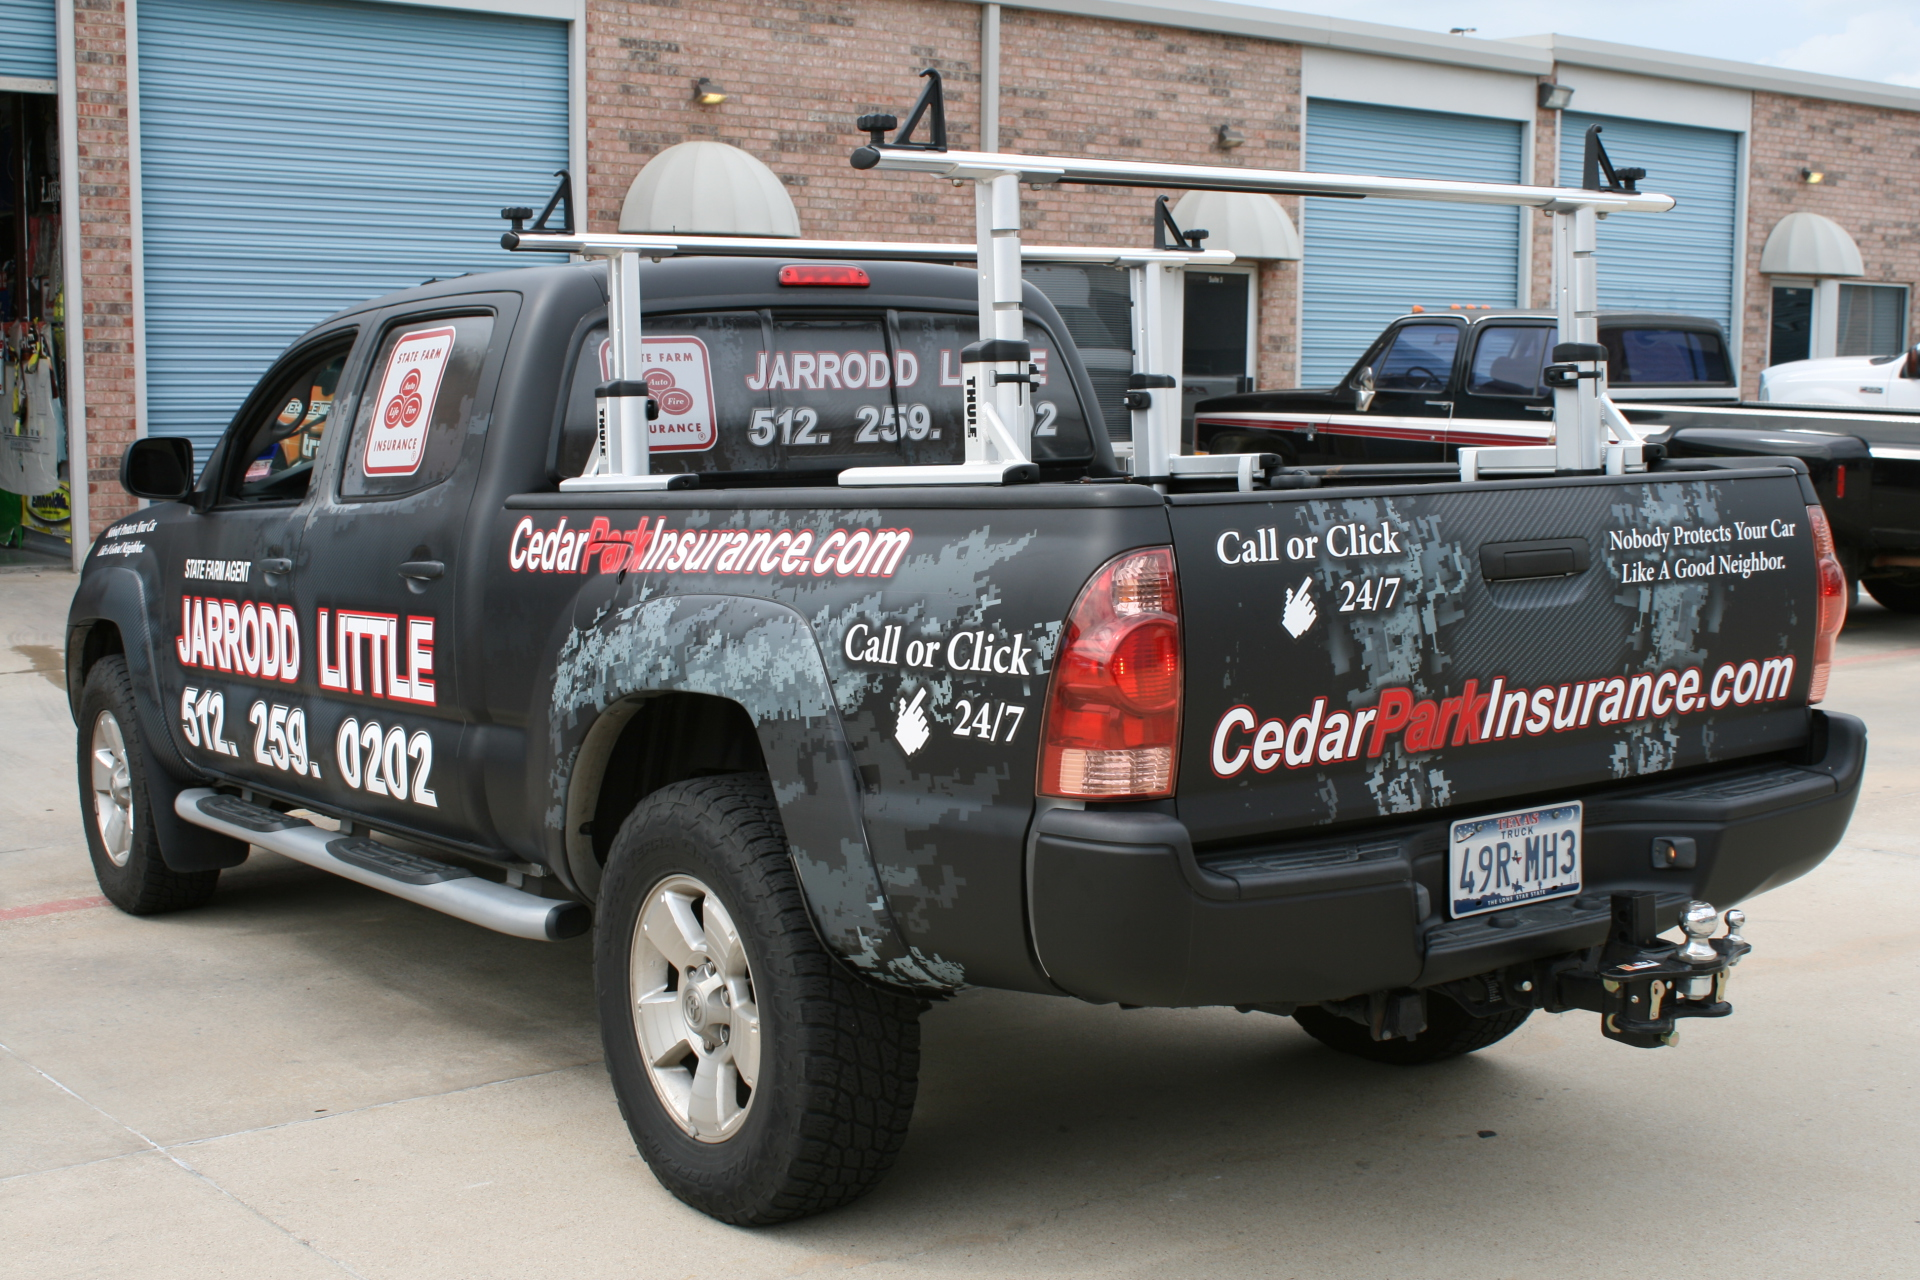 State Farm Agent Jarrodd Little, State Farm Vehicle Wraps, vehicle wraps dallas tx